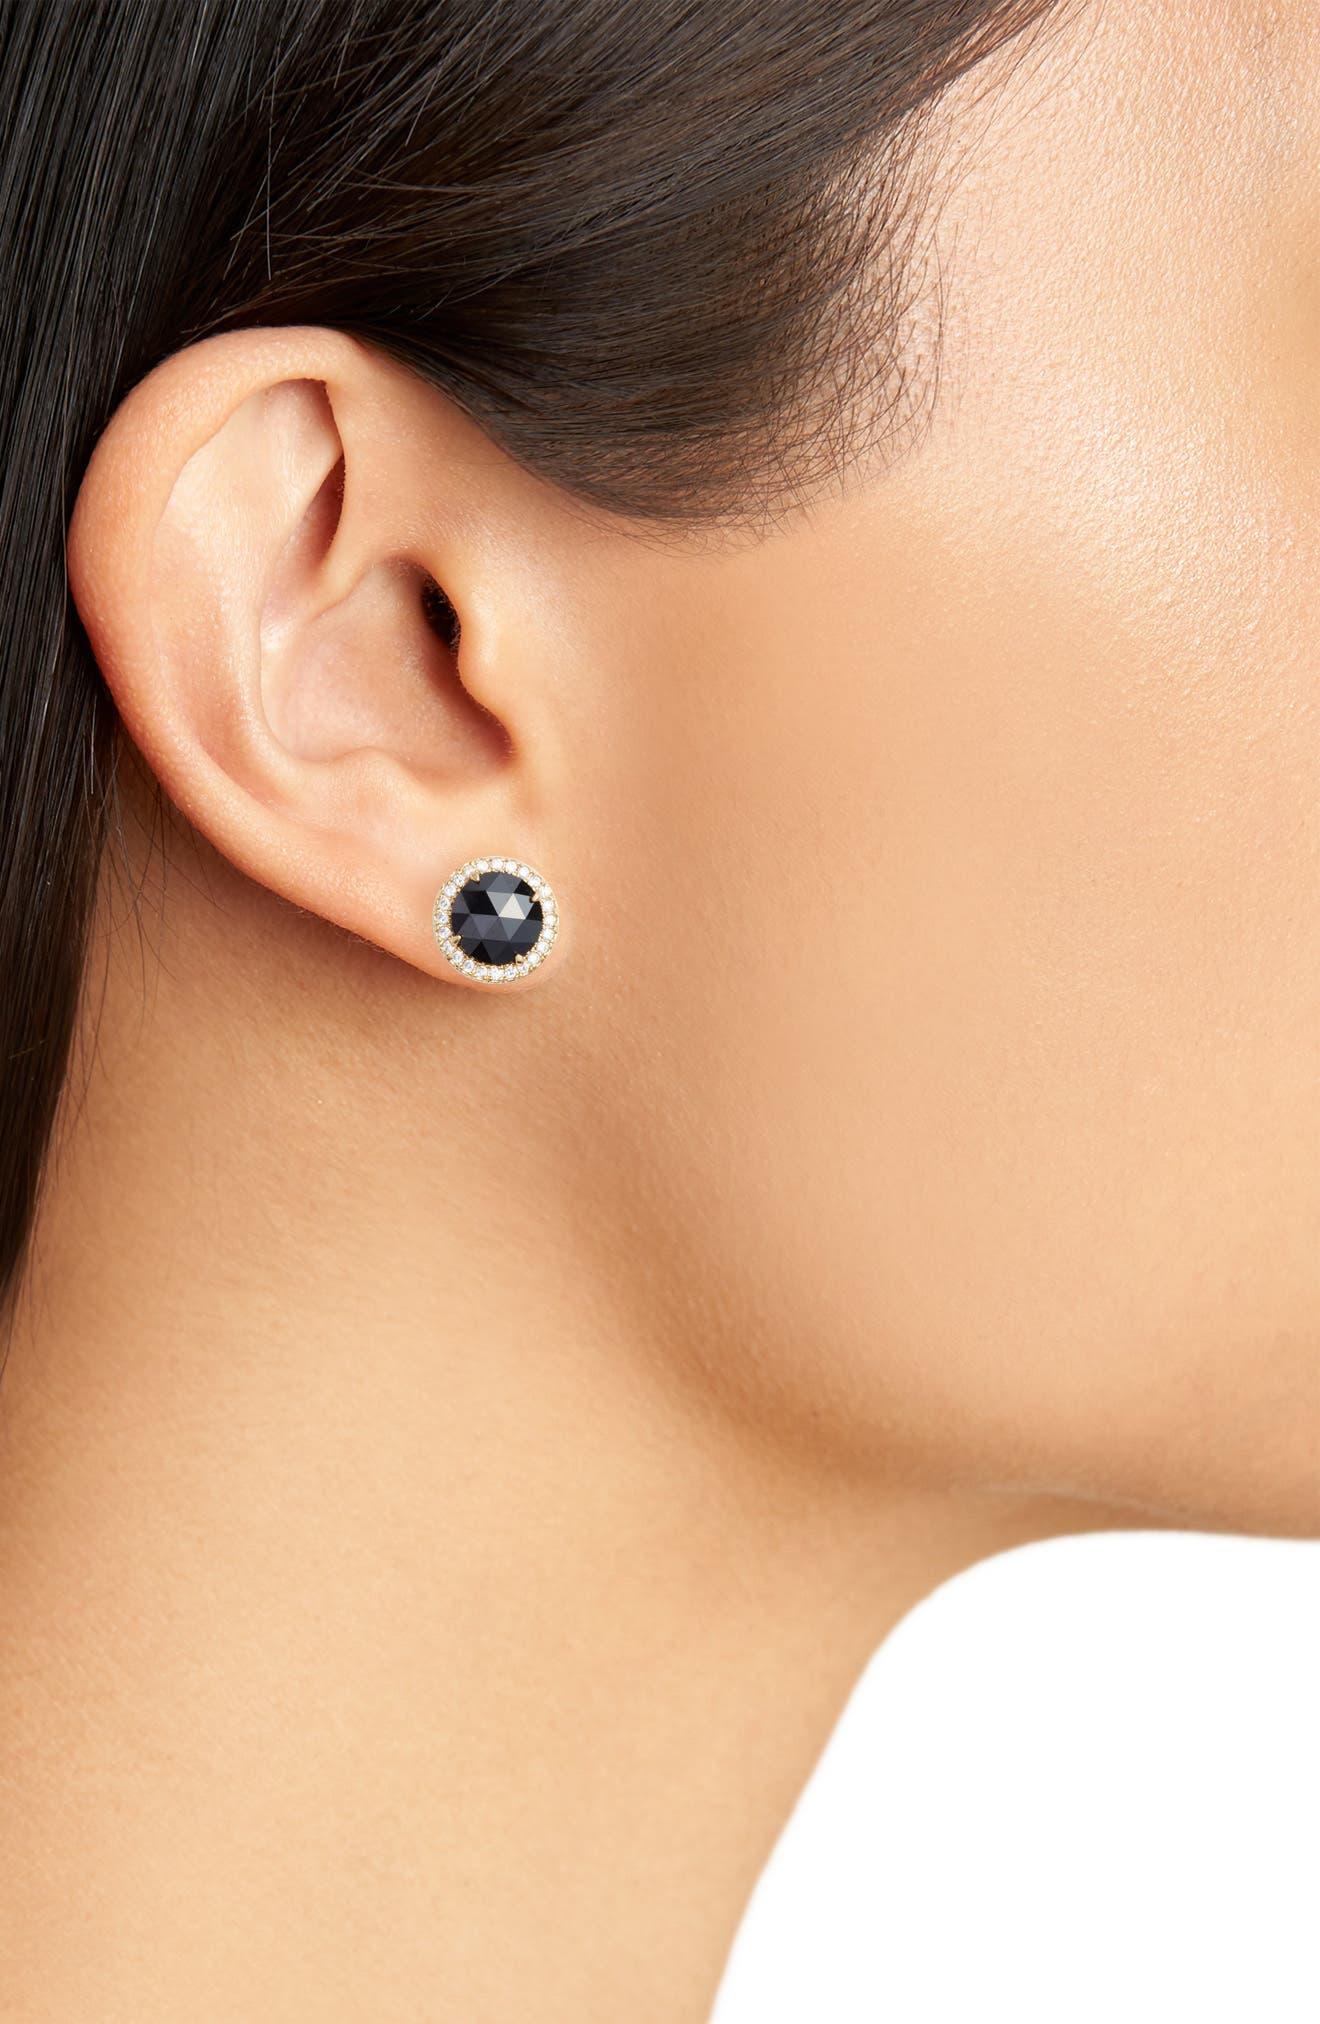 KATE SPADE NEW YORK, bright ideas pavé halo stud earrings, Alternate thumbnail 2, color, JET